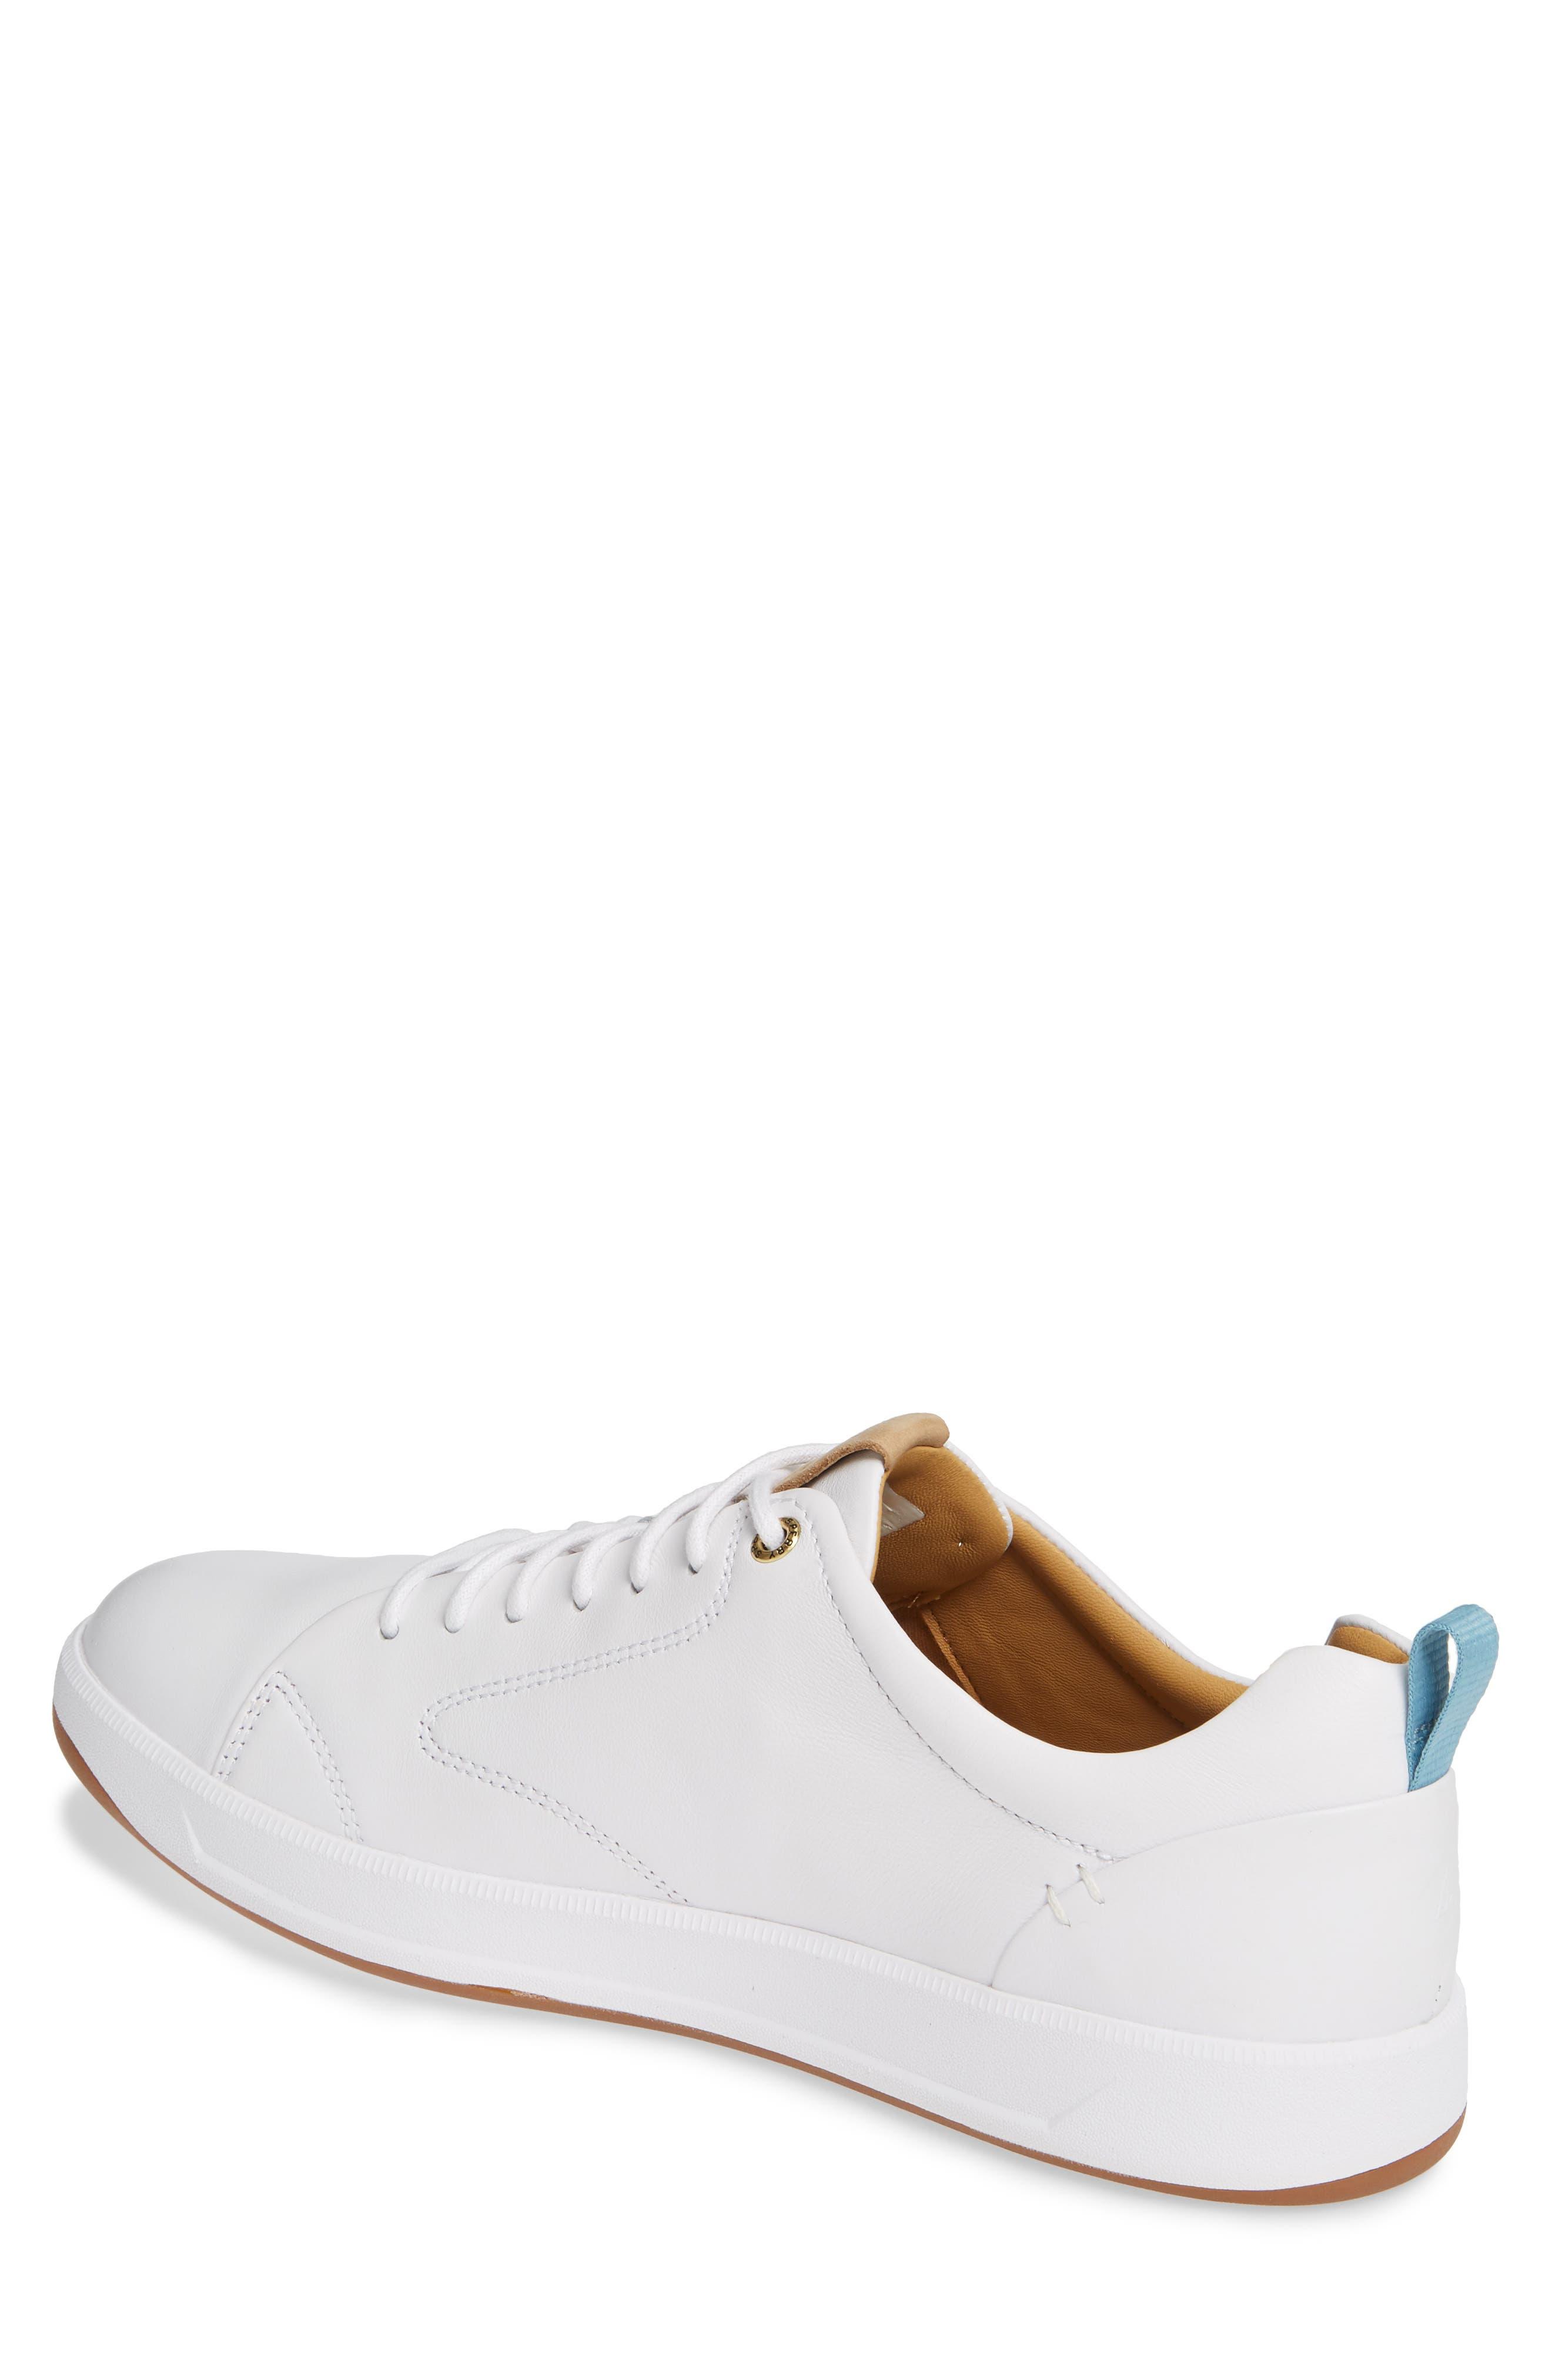 SPERRY, Gold Cup Richfield LTT Sneaker, Alternate thumbnail 2, color, WHITE